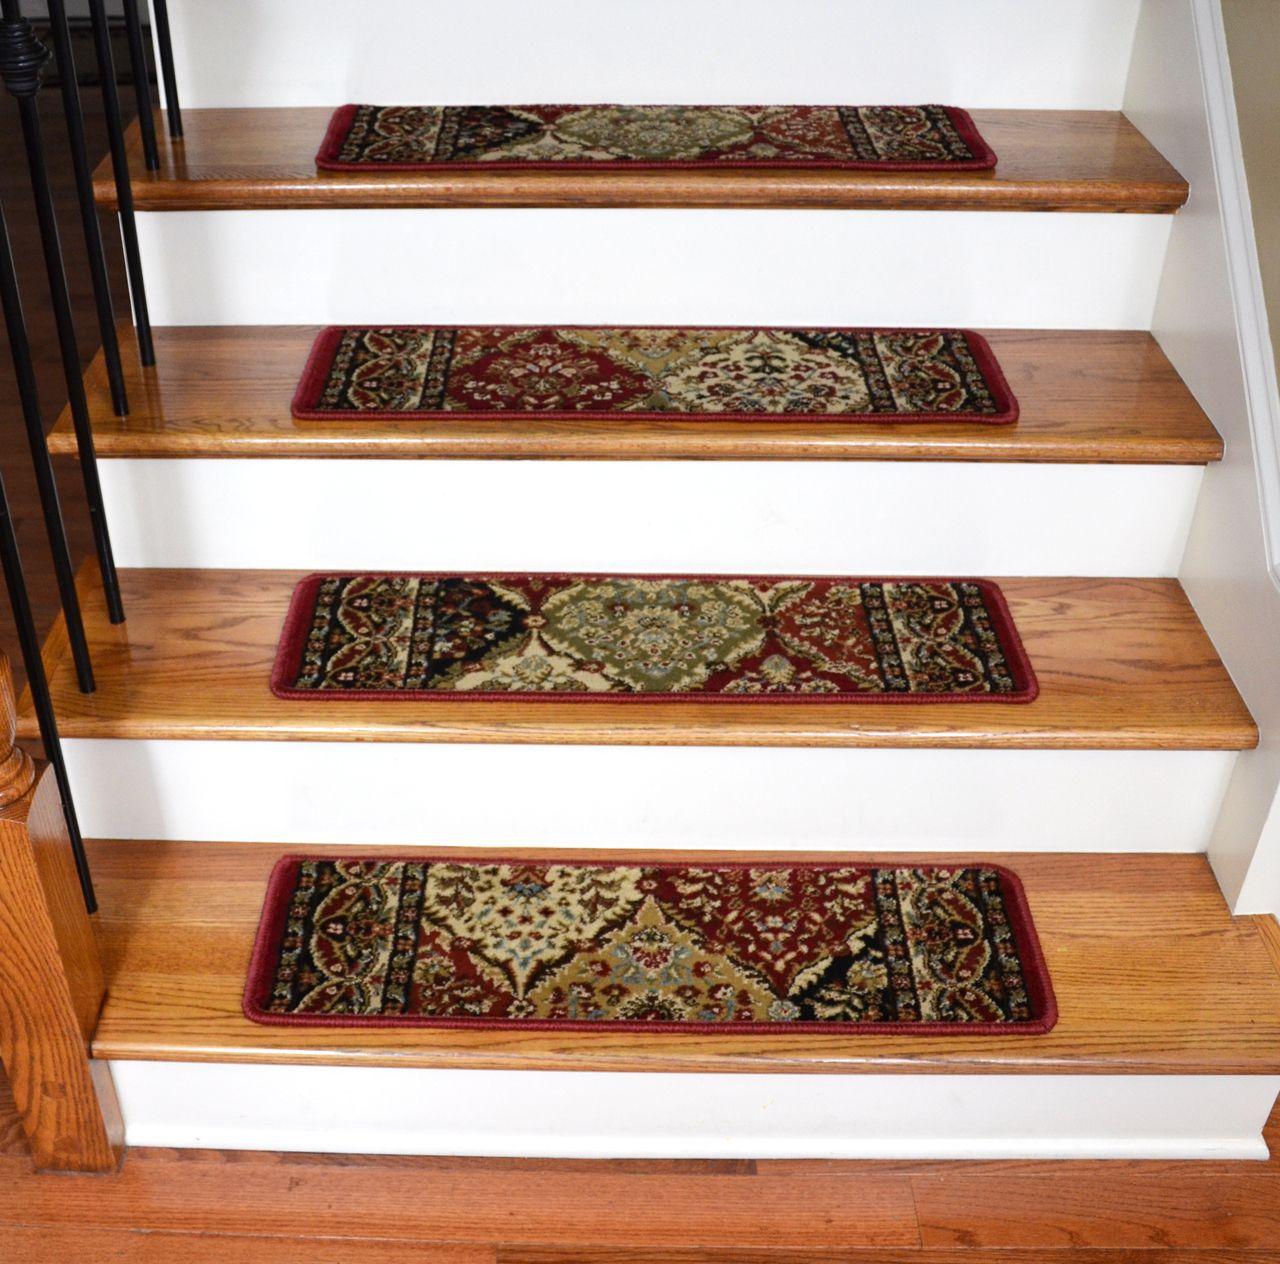 Best Dean Non Slip Pet Friendly Carpet Stair Step Cover Treads 400 x 300